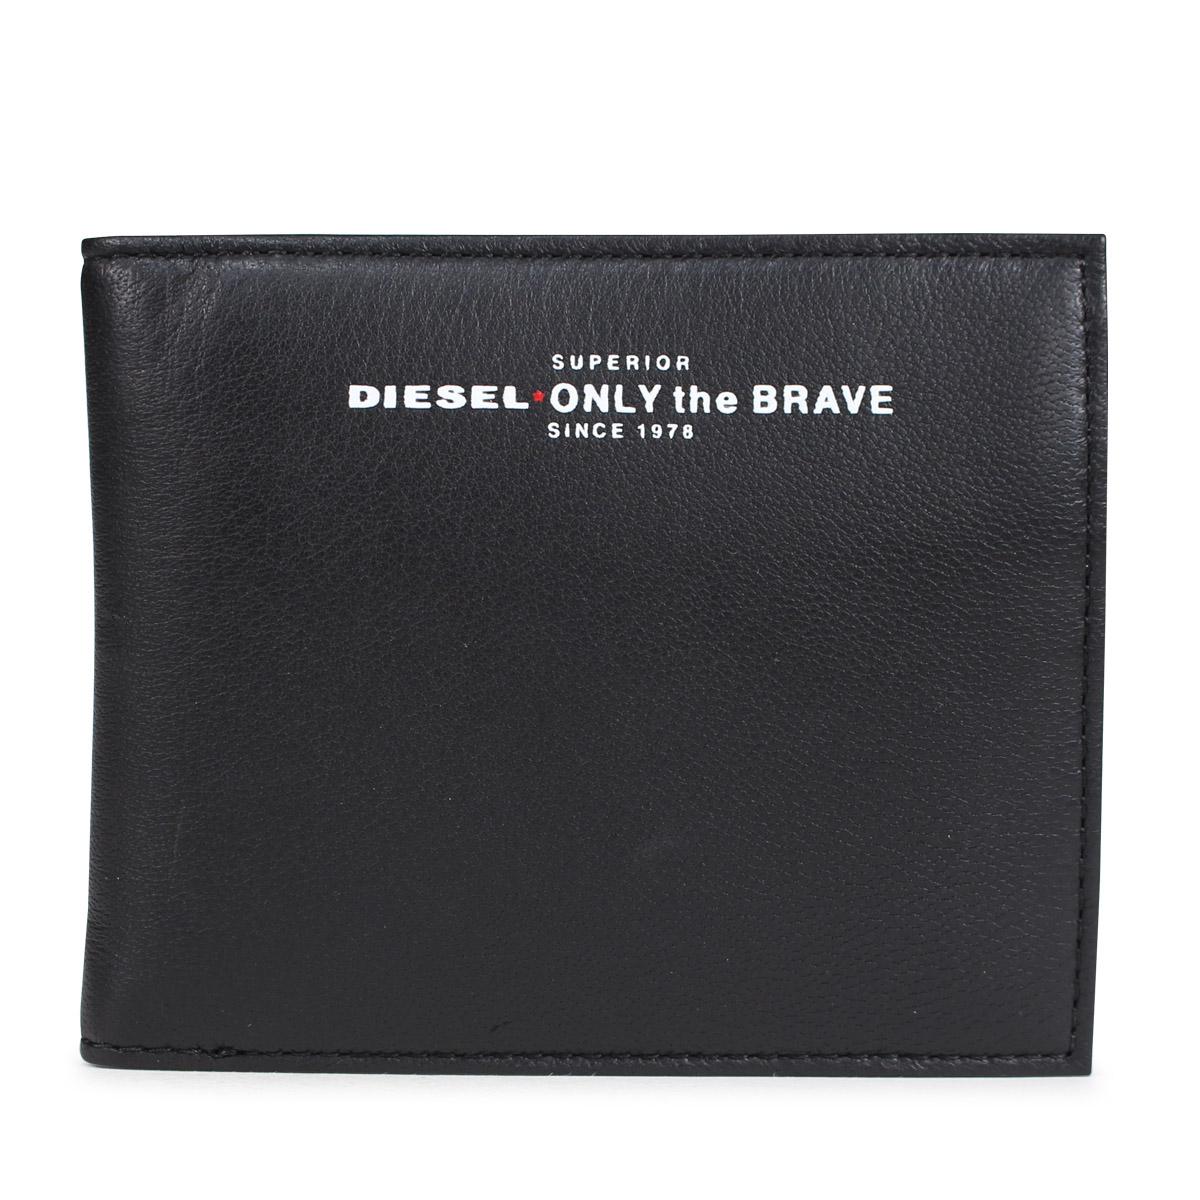 0282b5c41e42 DIESEL READY TO STAR HIRESH S diesel wallet men folio wallet X05590 PR400  H2691 black  10 12 Shinnyu load   1810